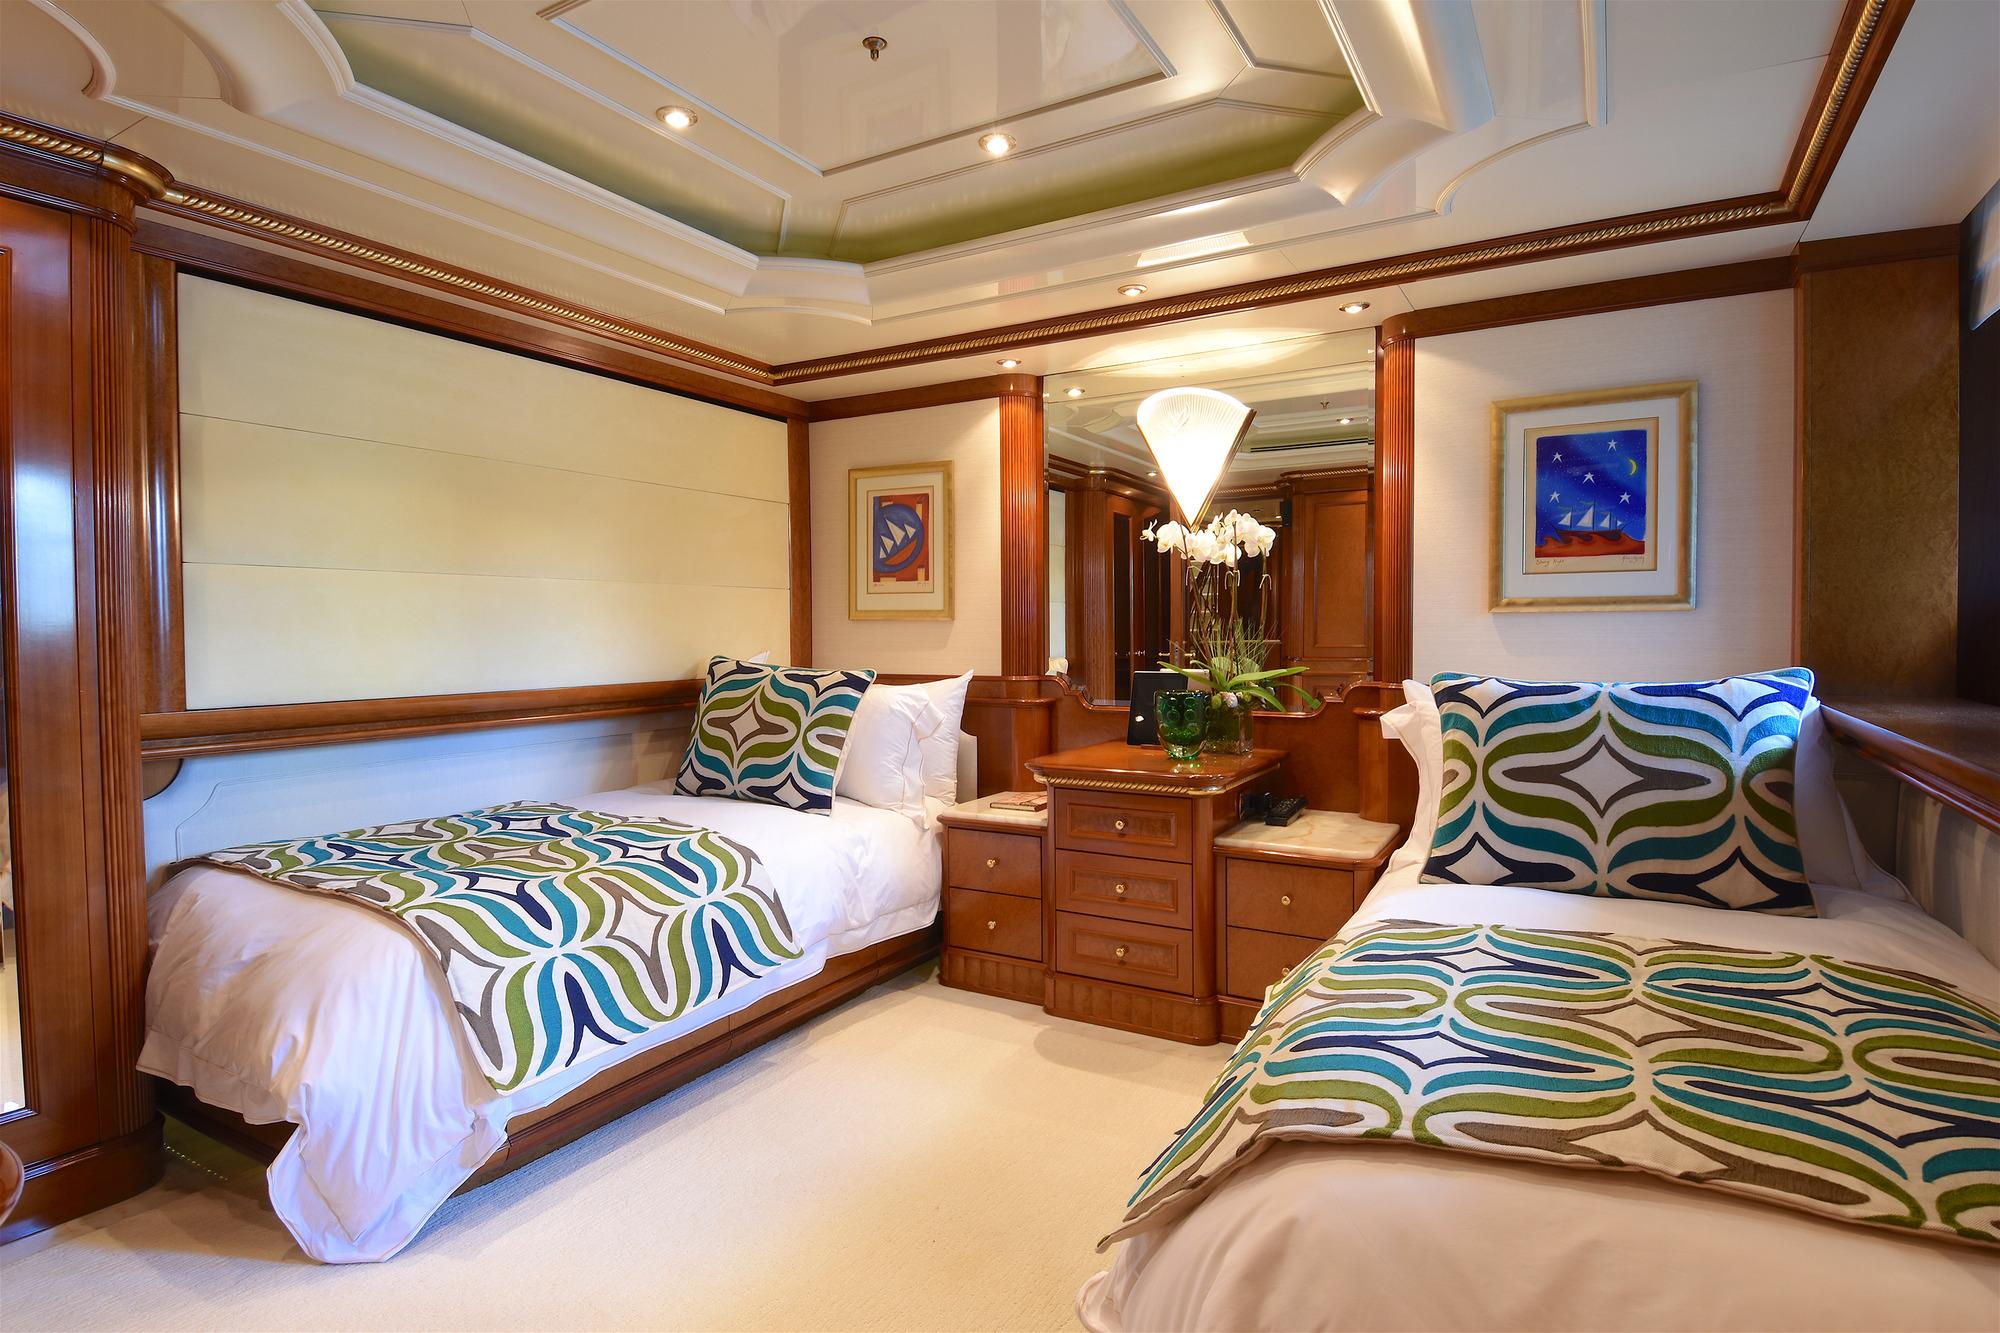 Benetti yacht LADY MICHELLE - Twin cabin